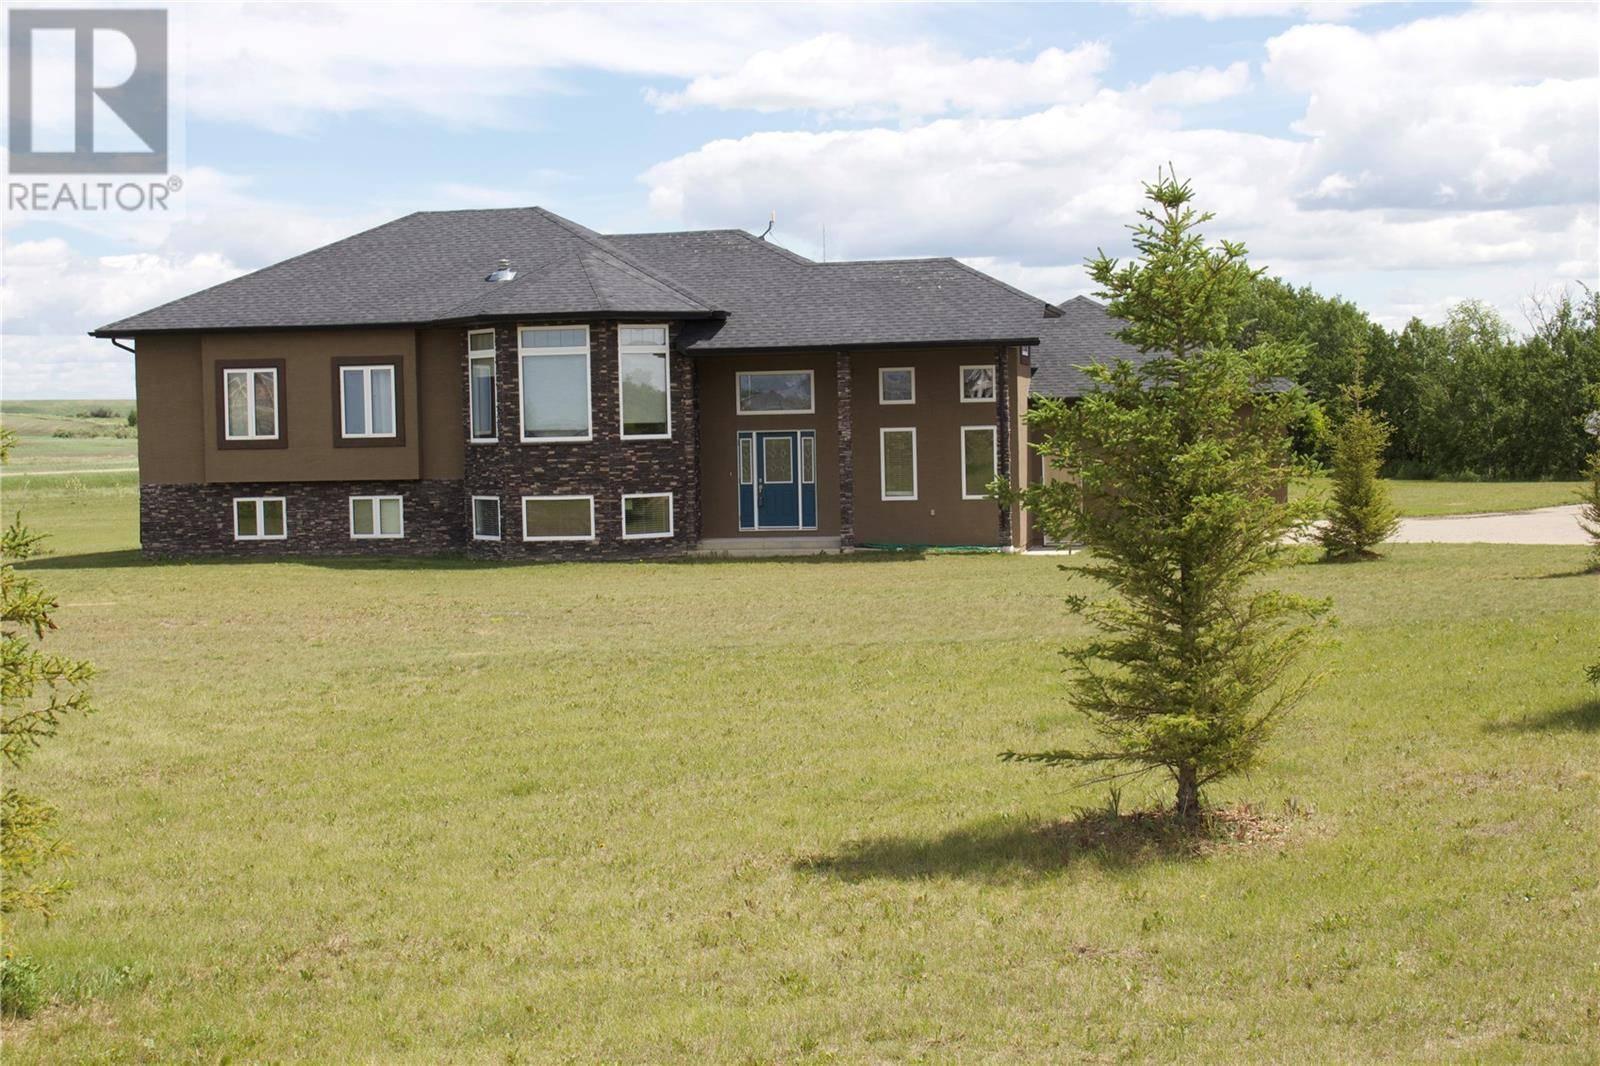 House for sale at 45 Mission Rdg  Aberdeen Rm No. 373 Saskatchewan - MLS: SK778748